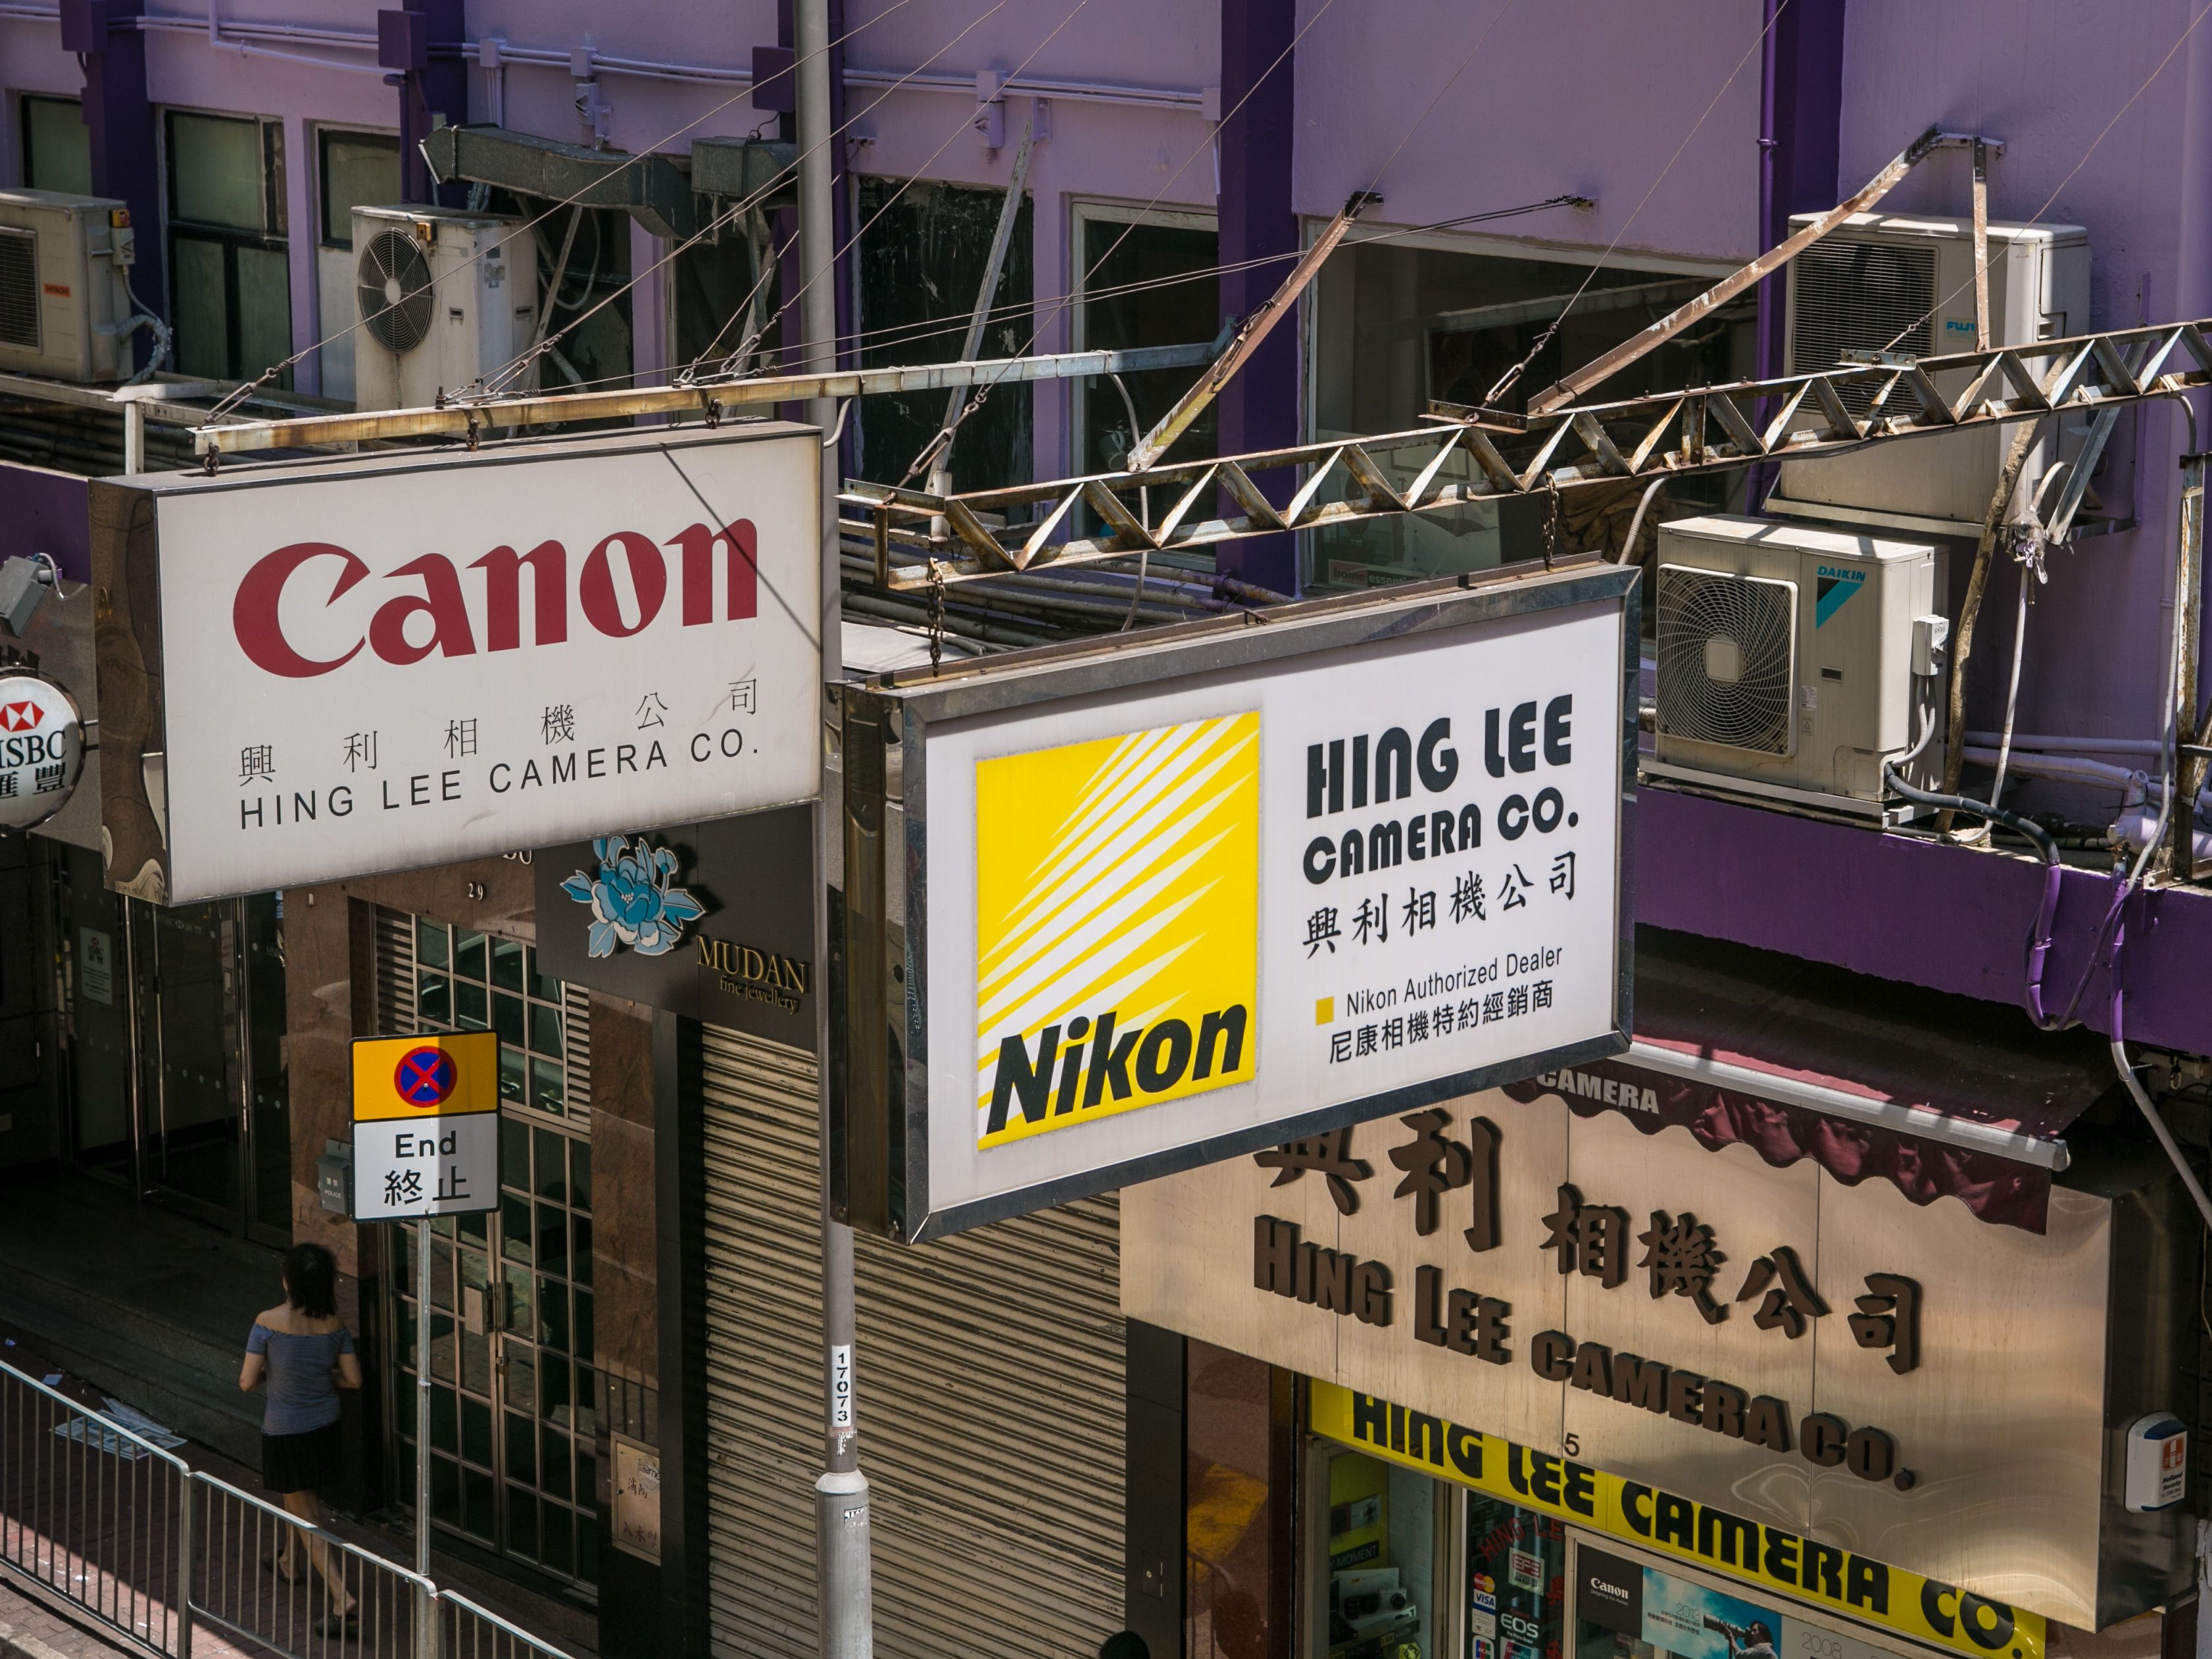 Tips on Buying a Camera in Hong Kong